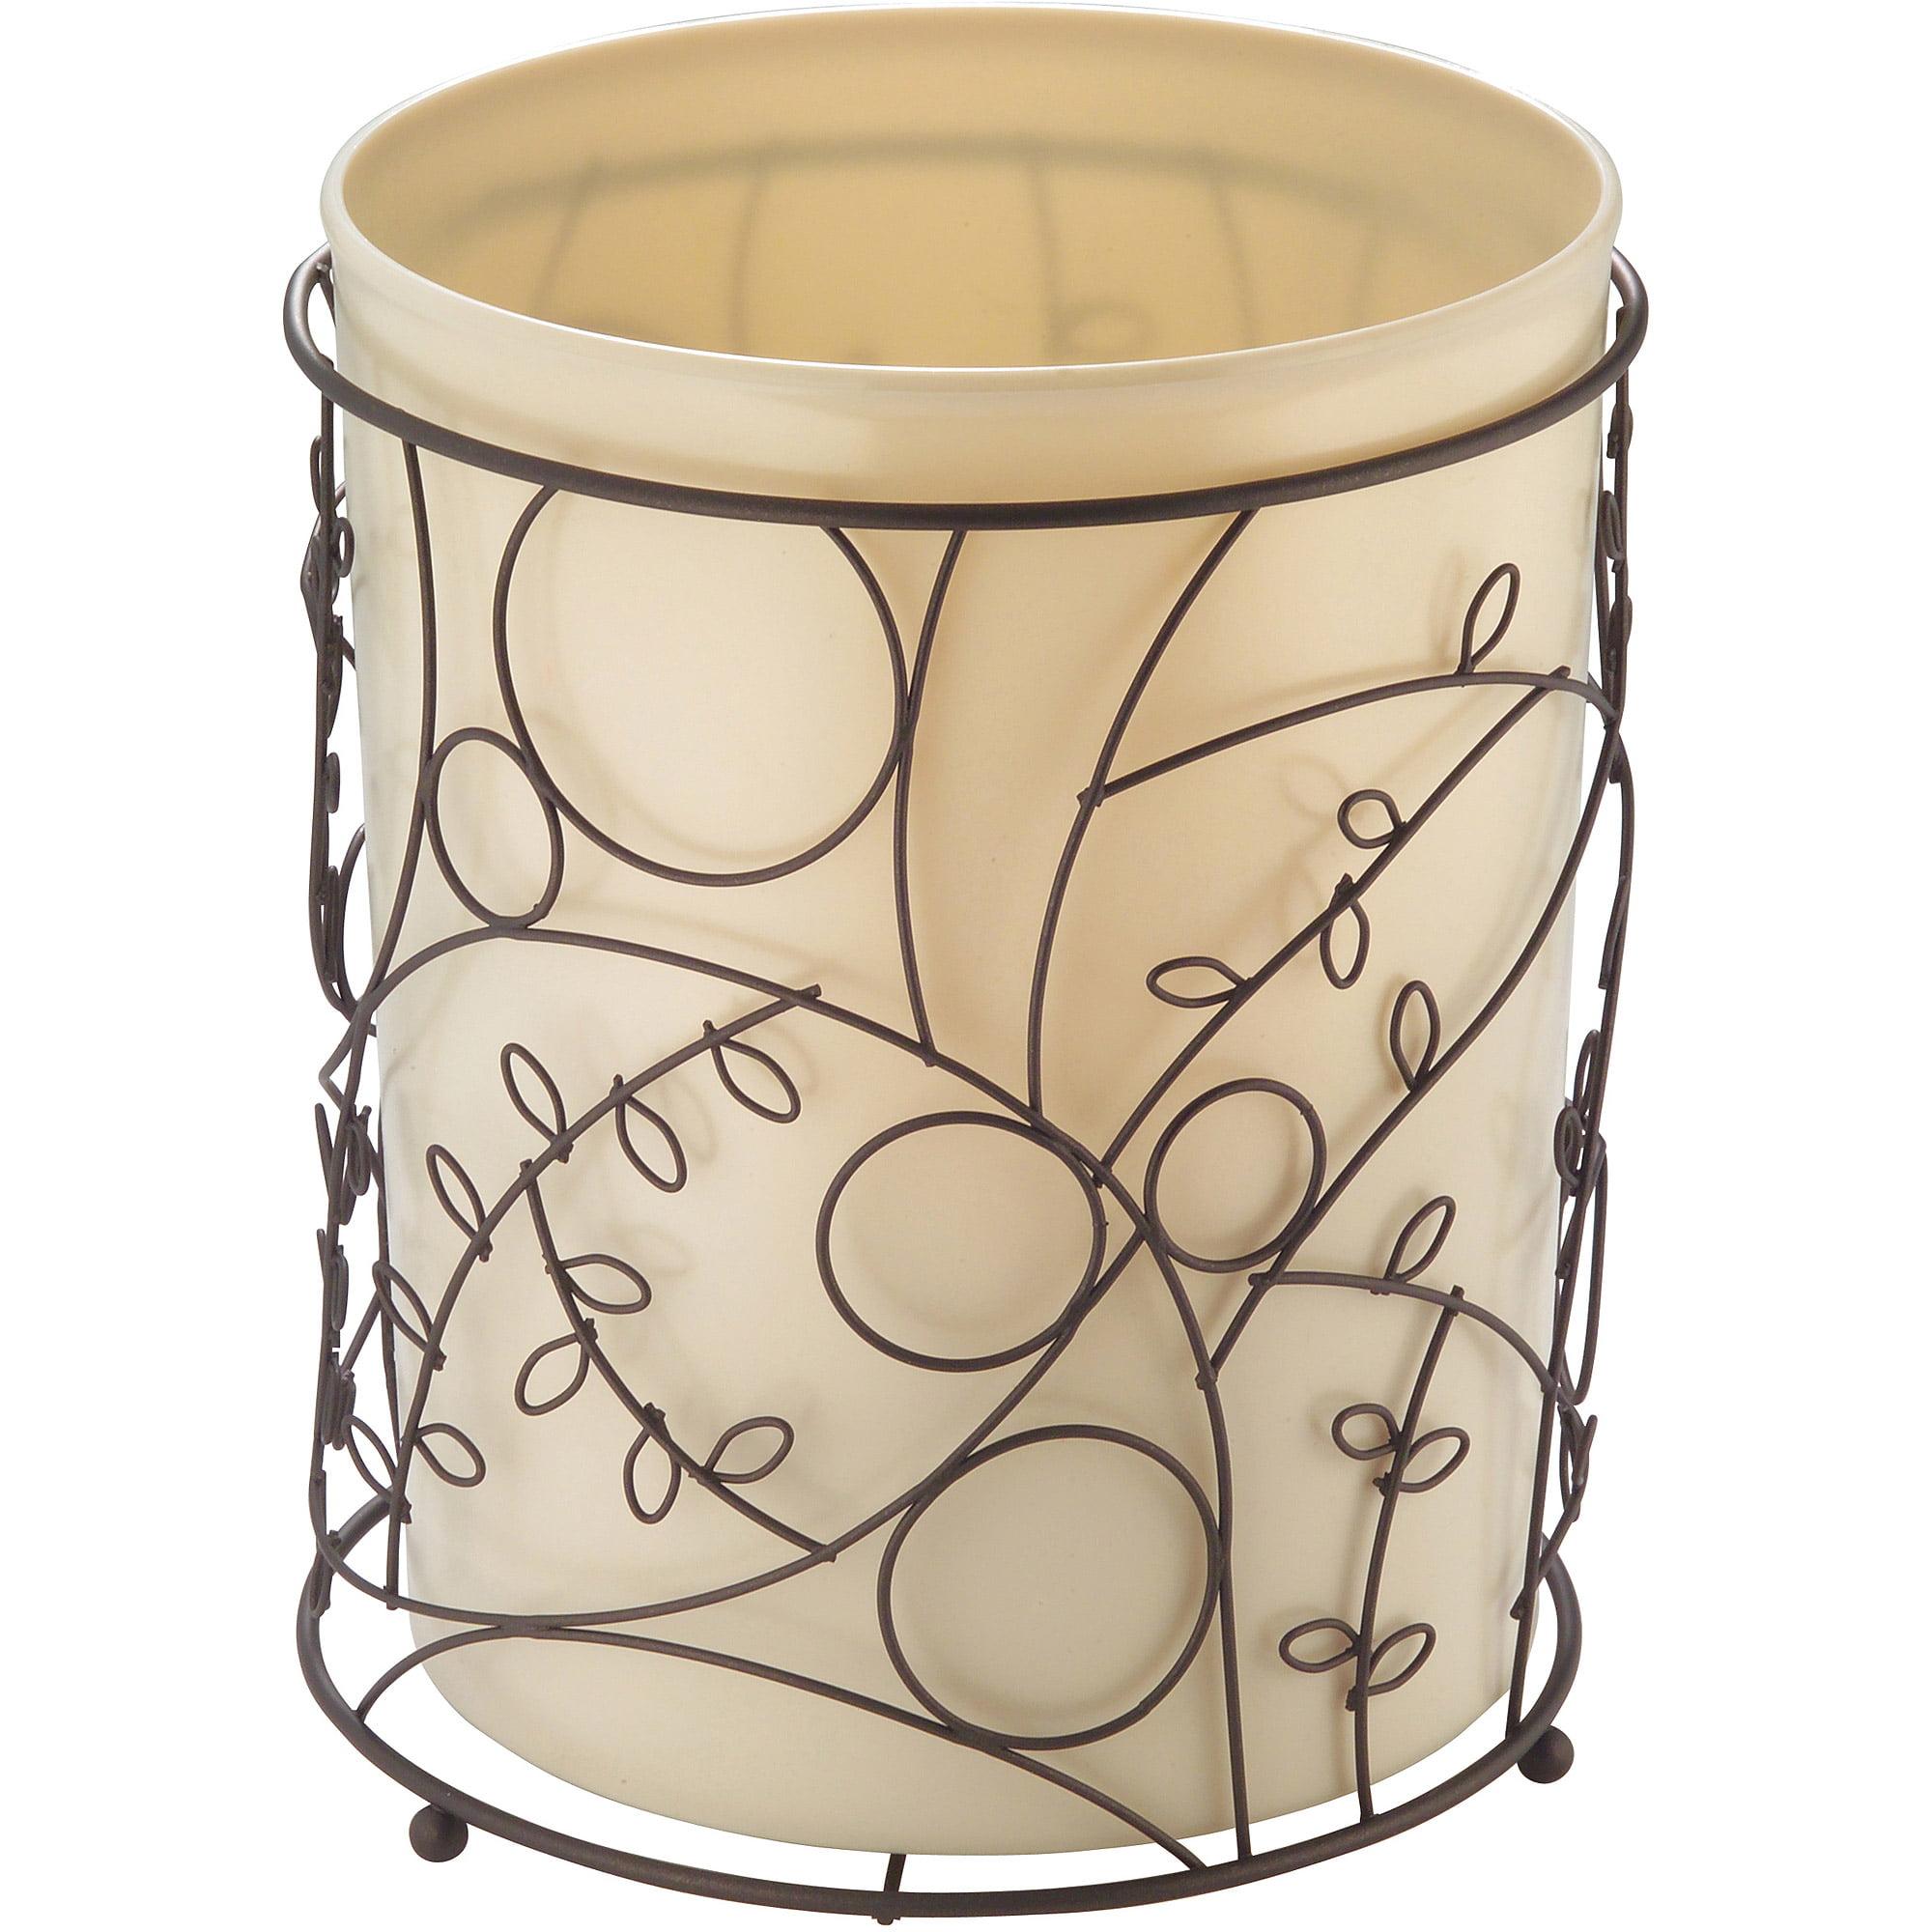 InterDesign Twigz Wastebasket Trash Can by Generic